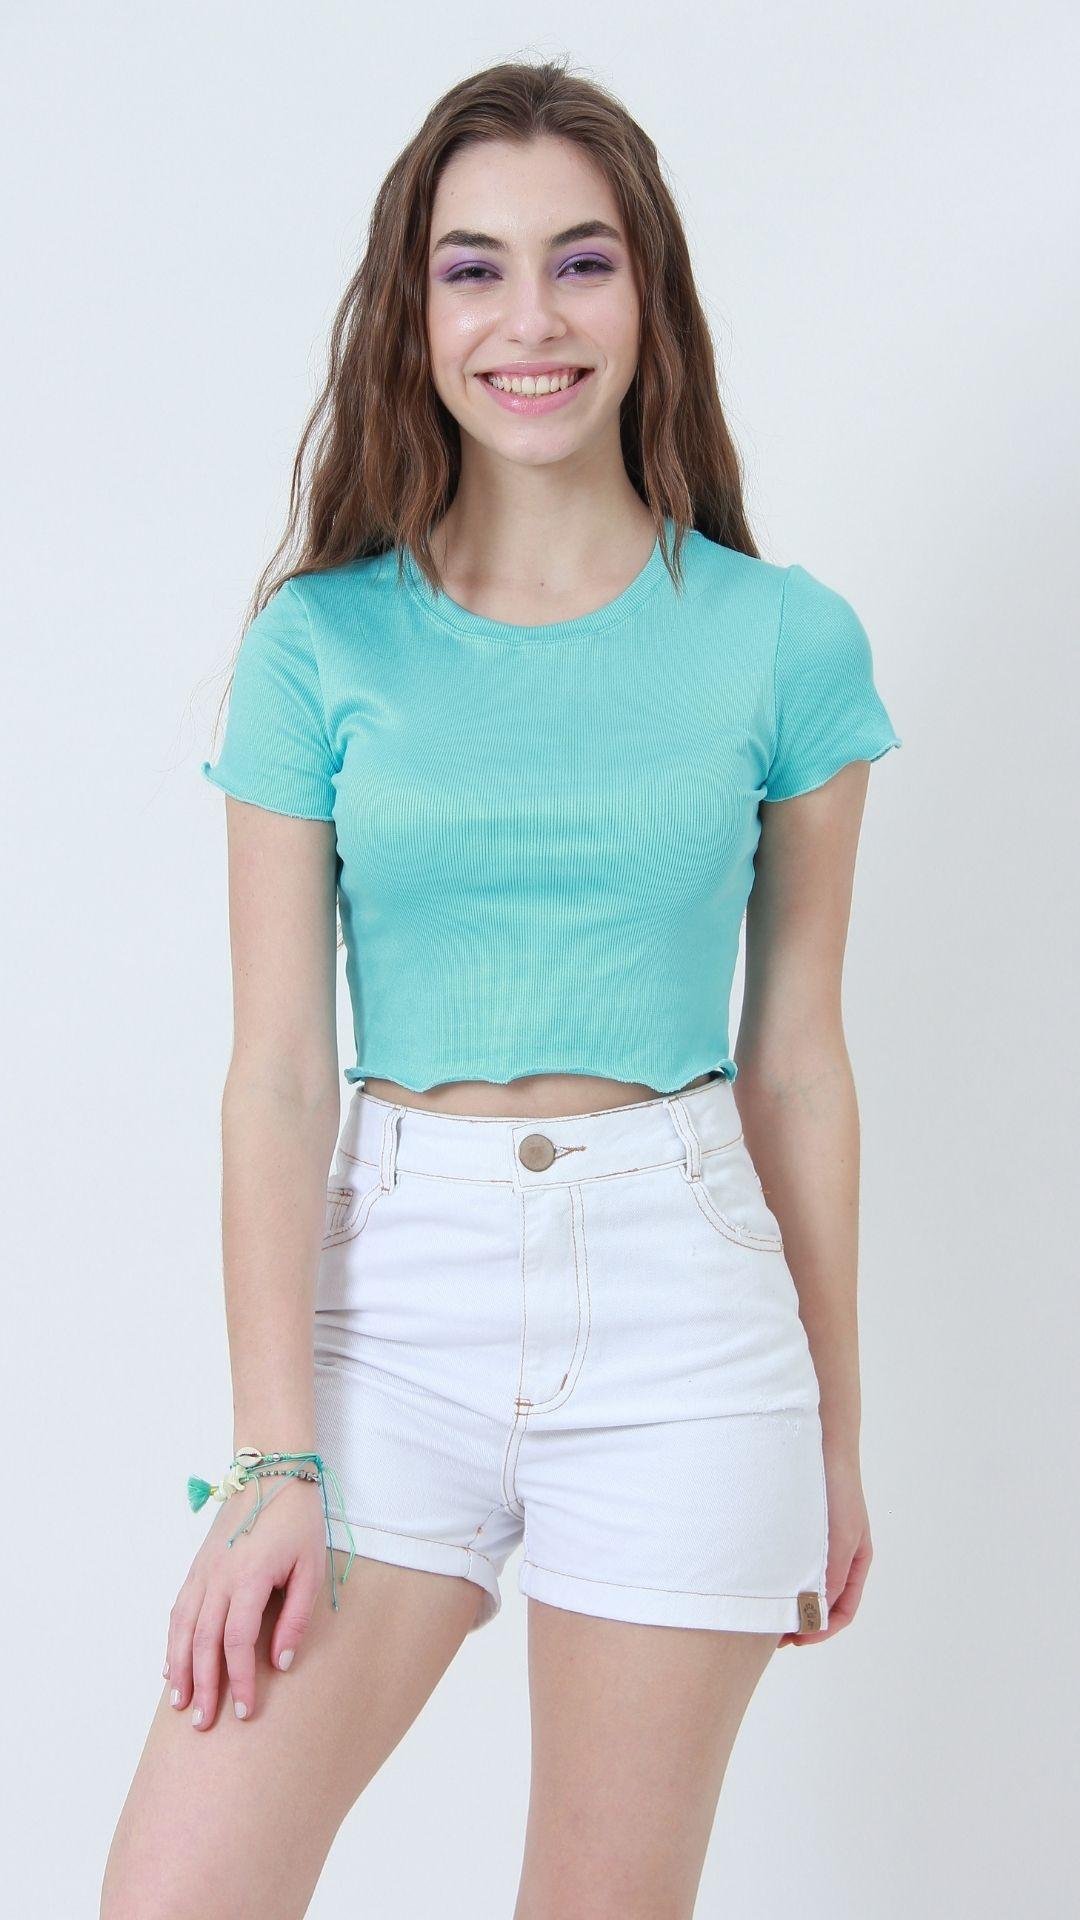 T-shirt Ribbed Turquesa  - Metro & Co.